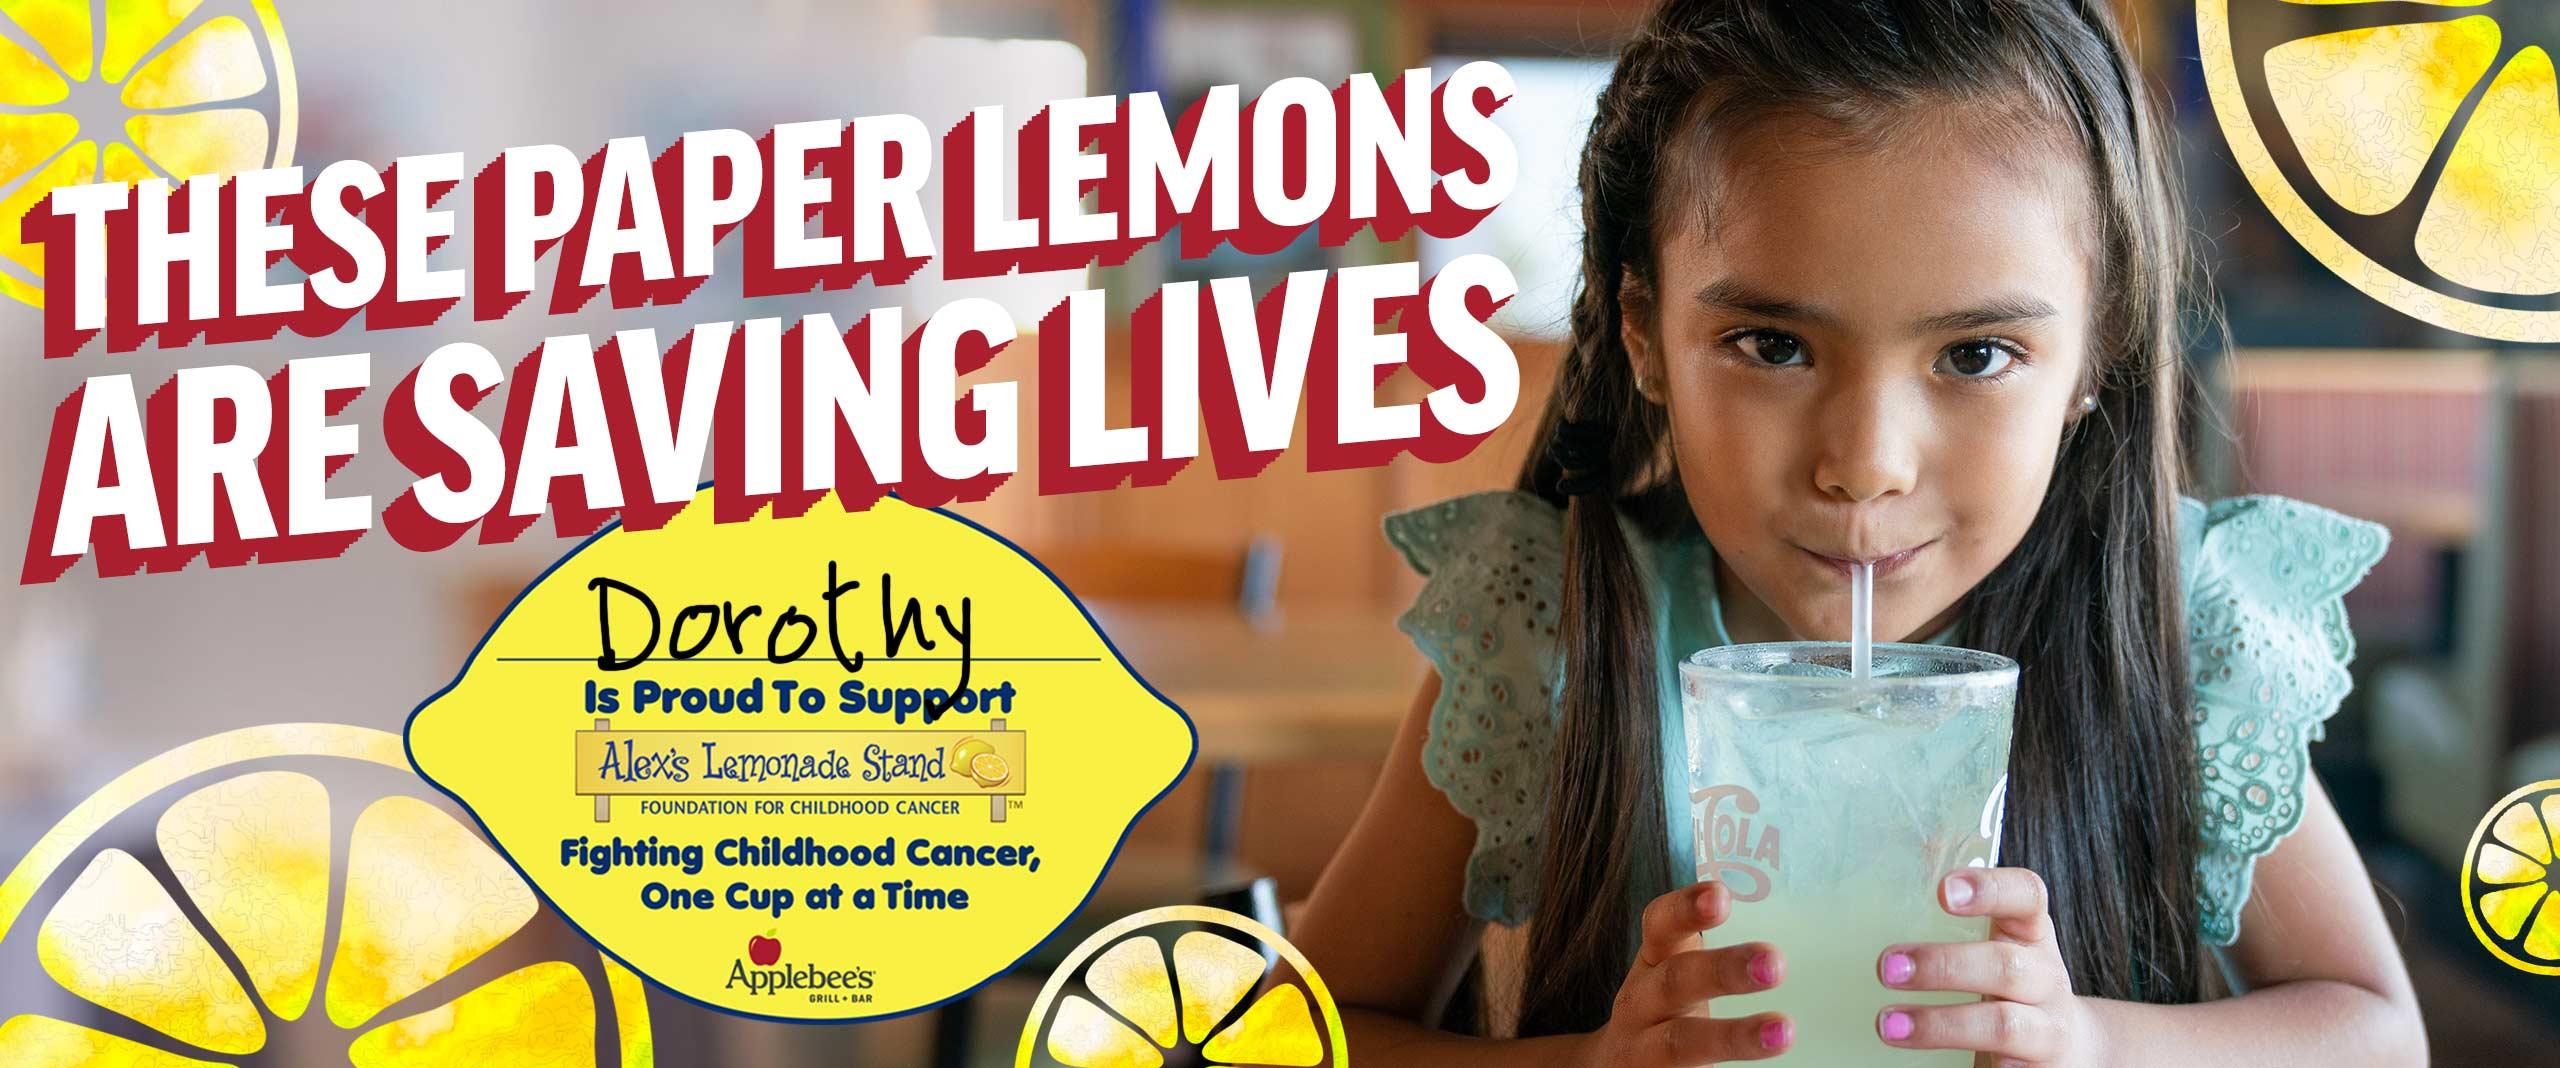 Applebee's + Alex's Lemonade Stand Team Up To Fight Childhood Cancer